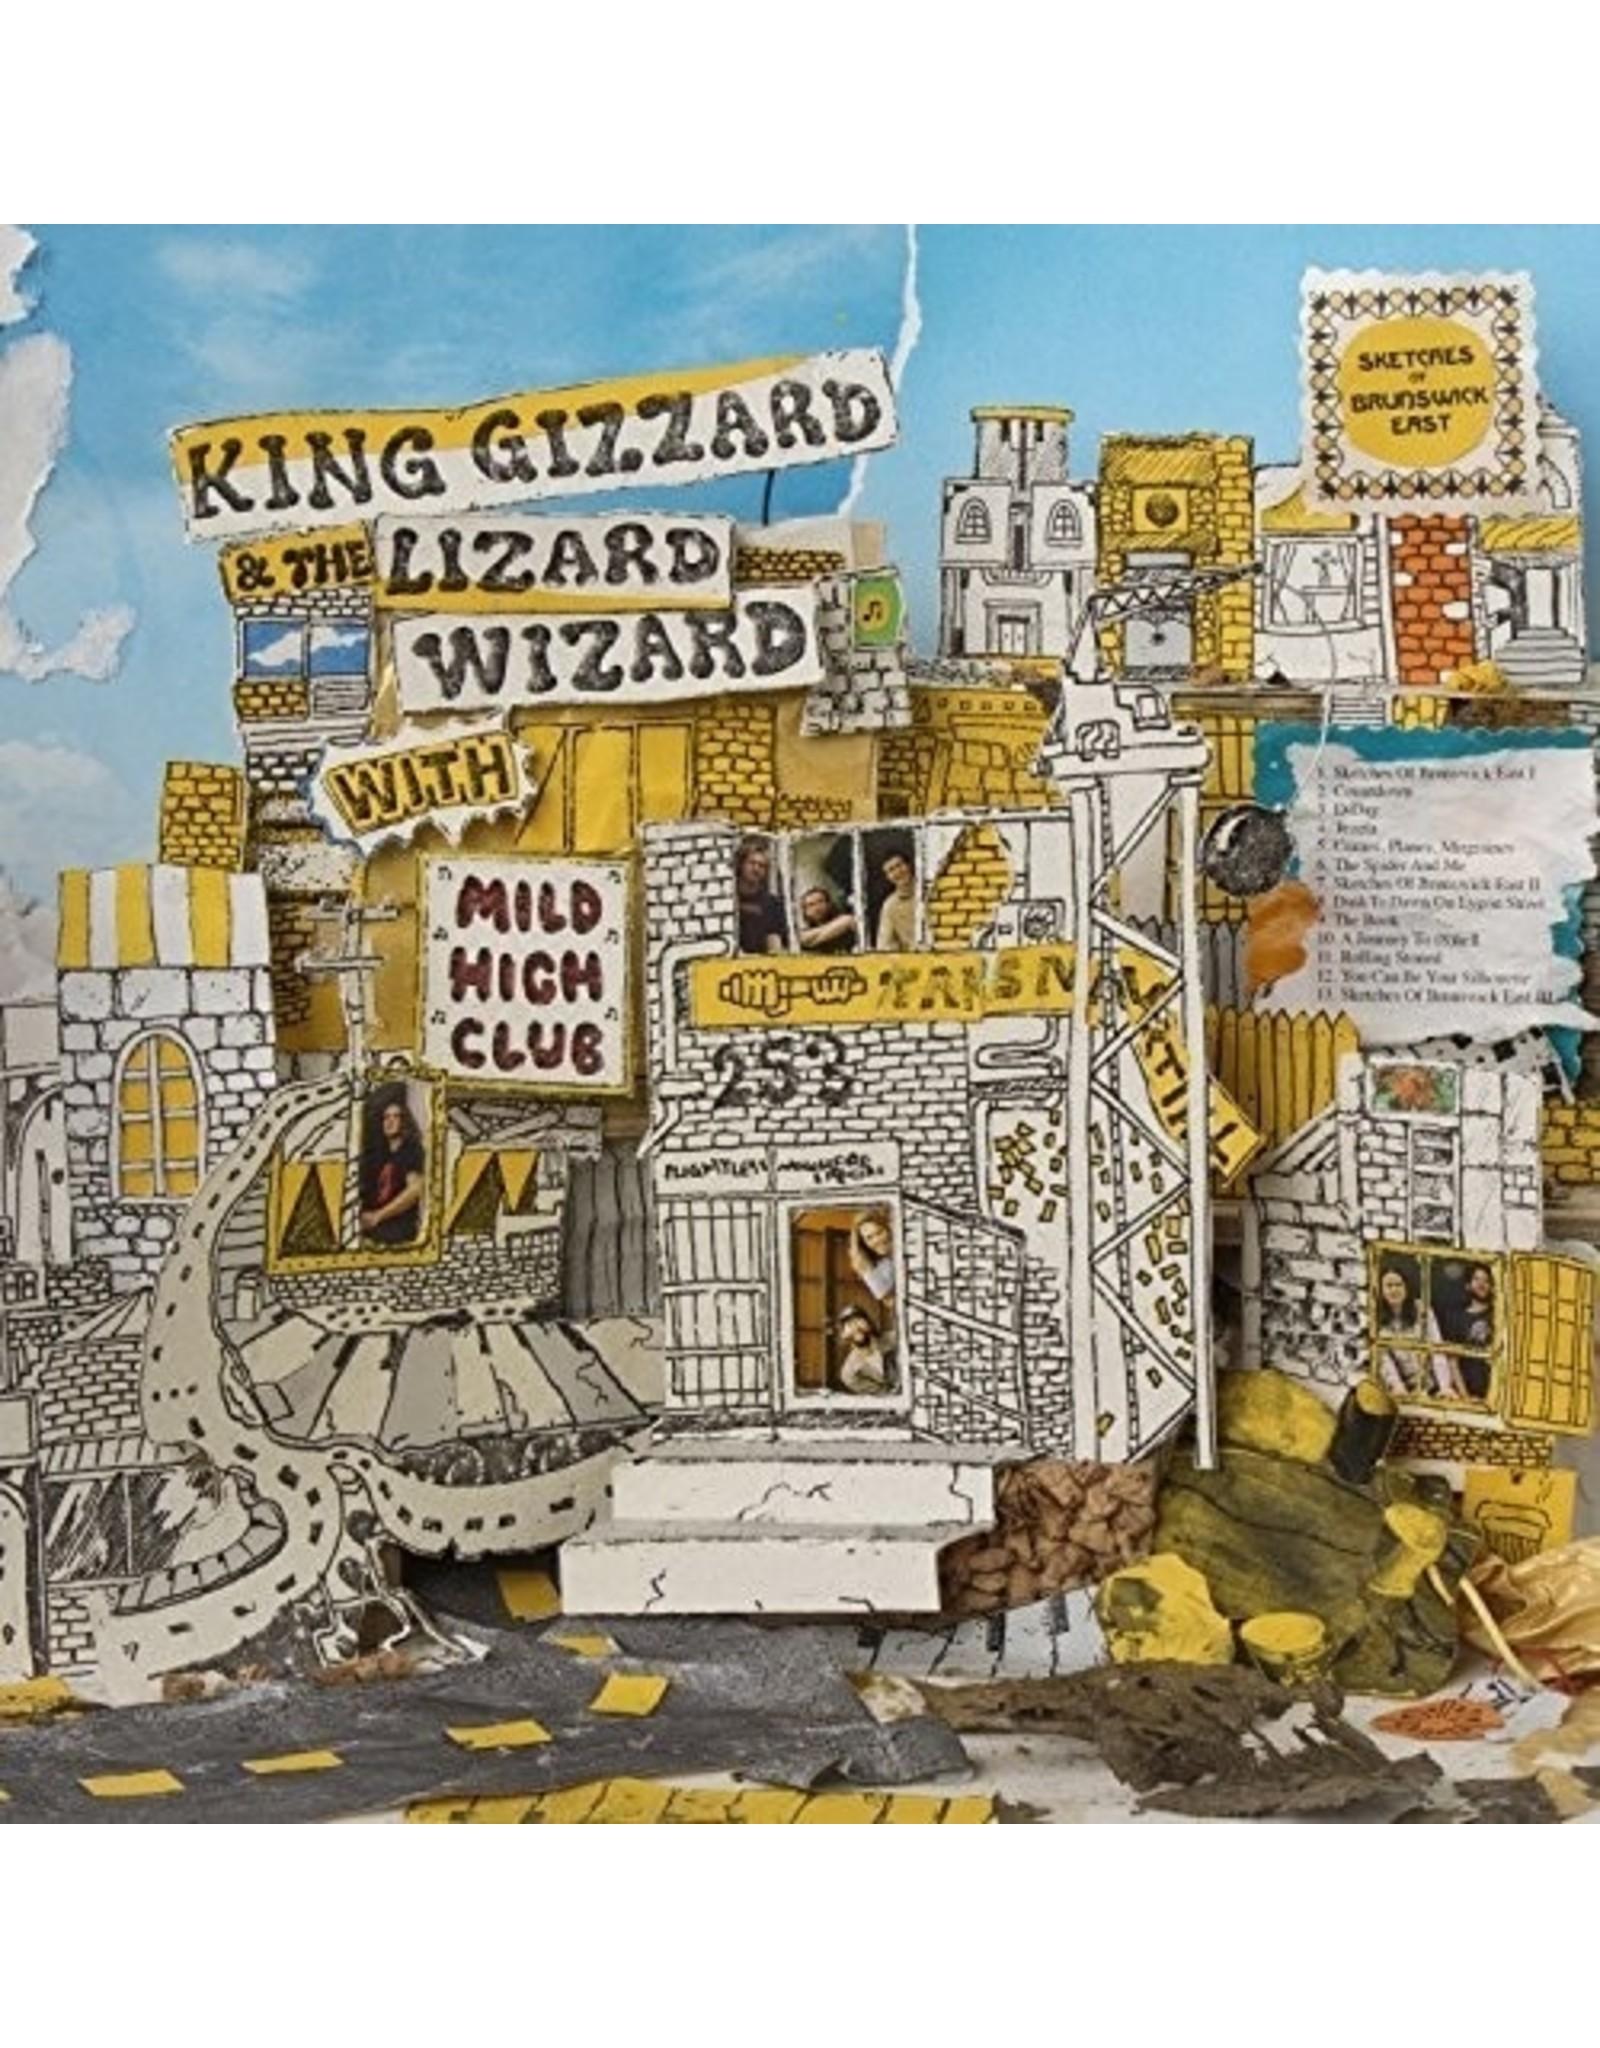 New Vinyl King Gizzard & The Lizard Wizard w/ Mild High Club - Sketches Of Brunswick East LP